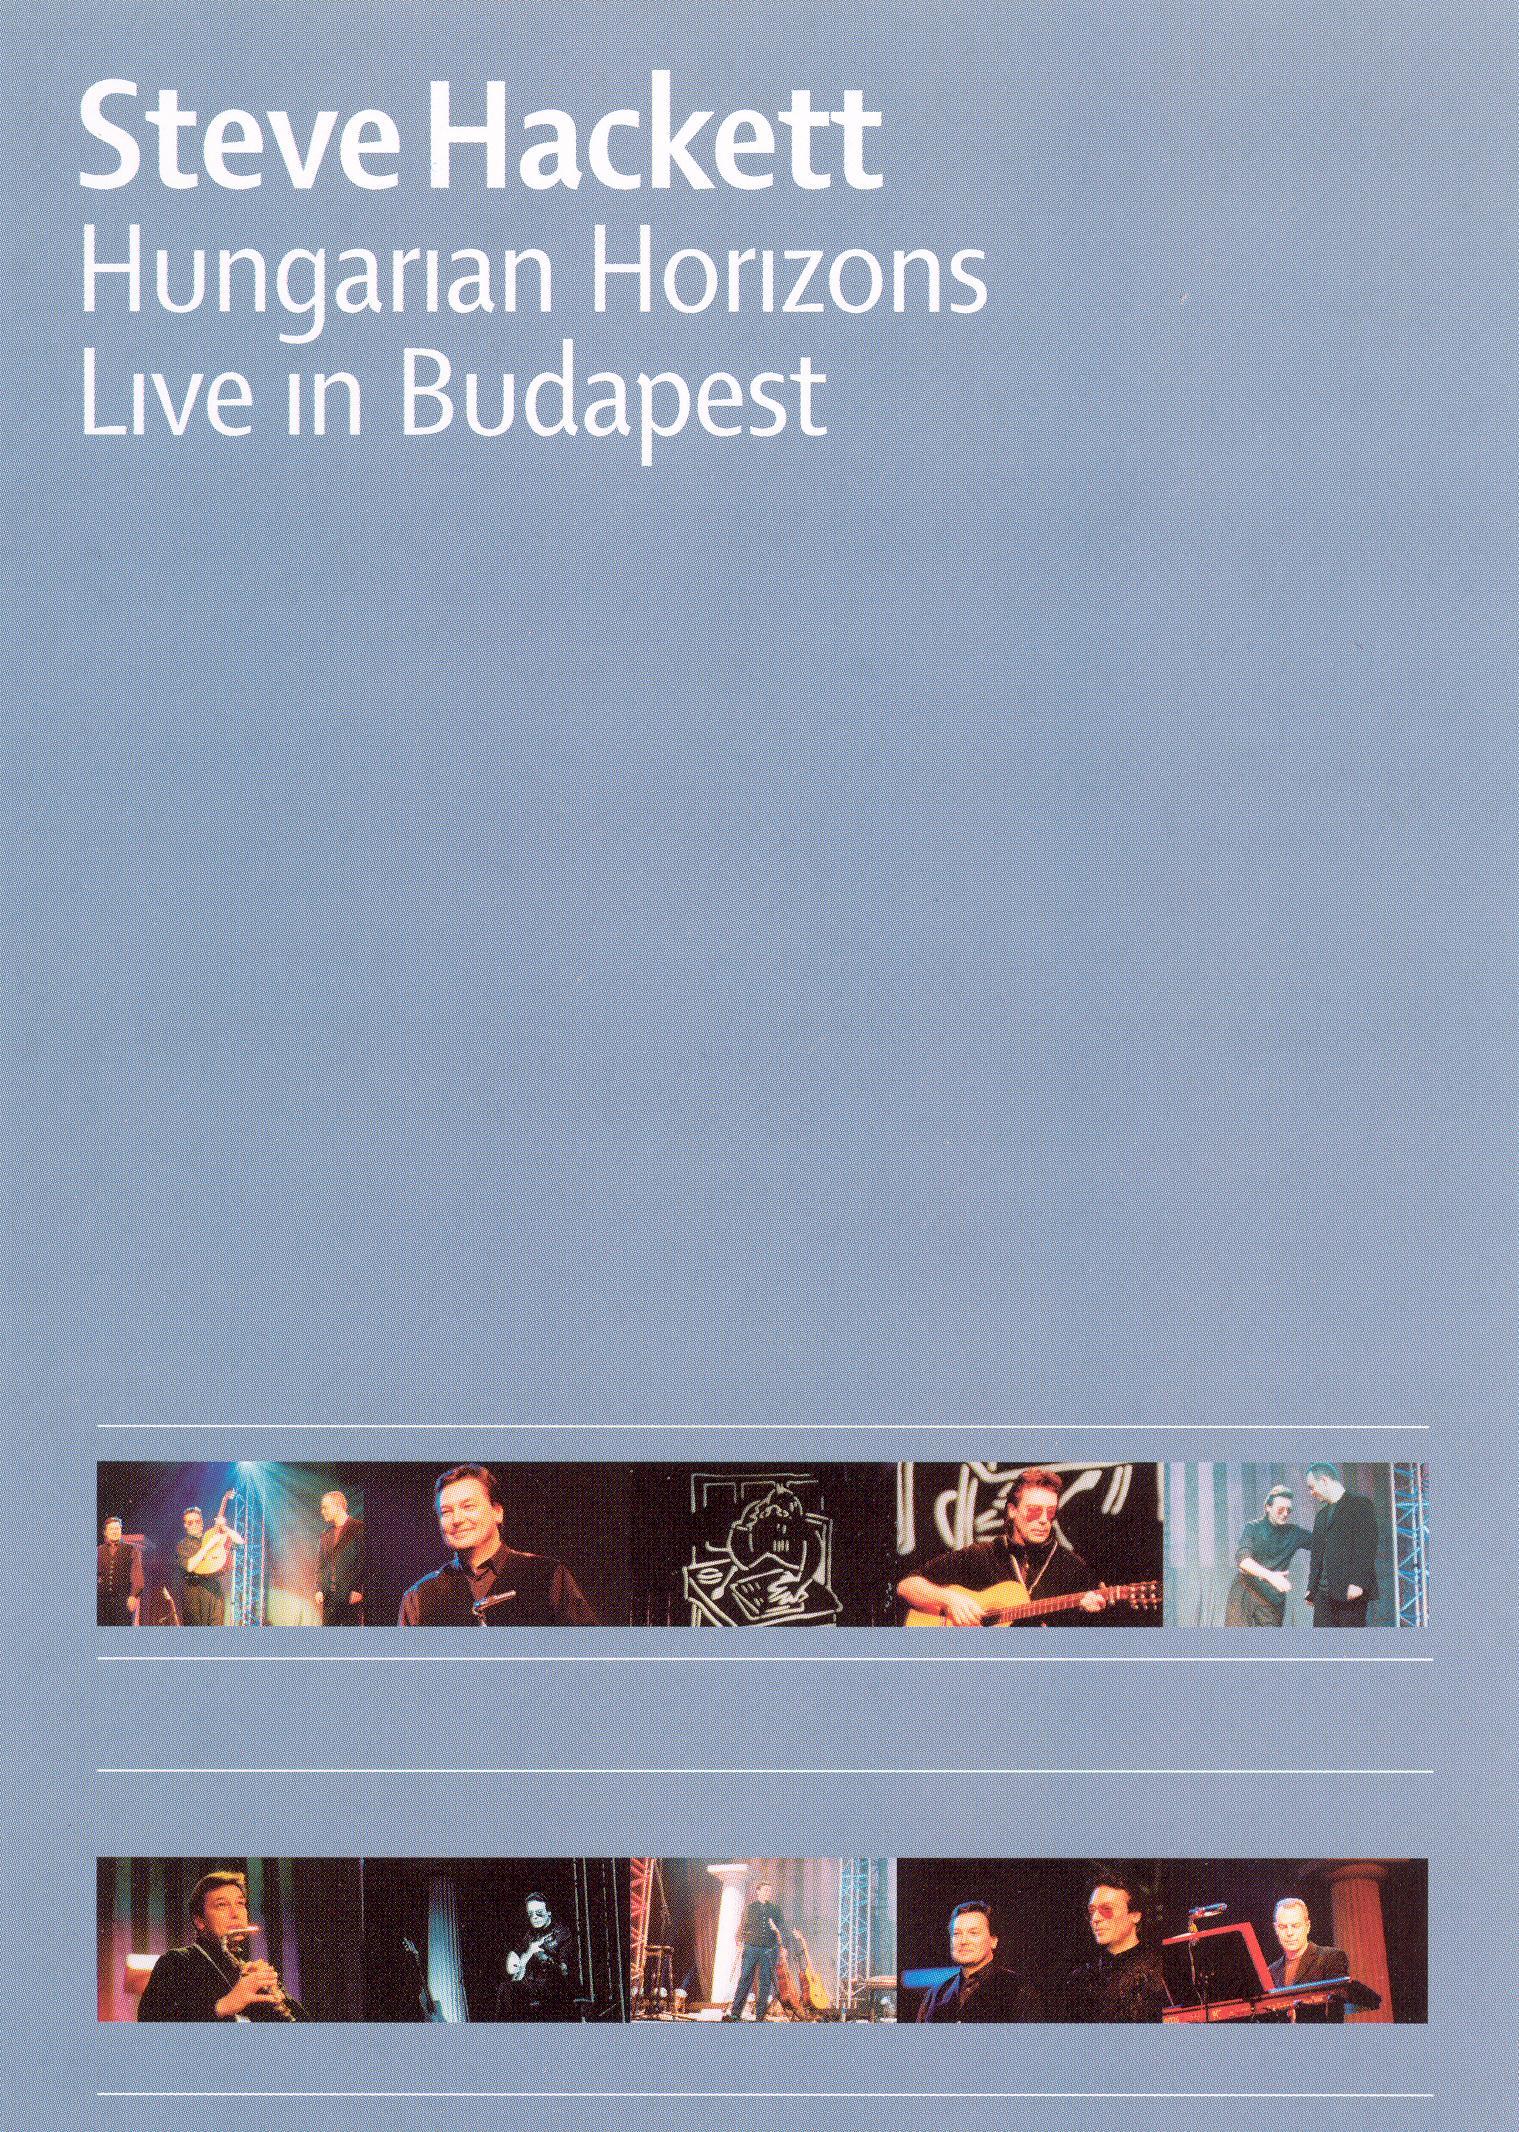 Steve Hackett: Hungarian Horizons - Live in Budapest